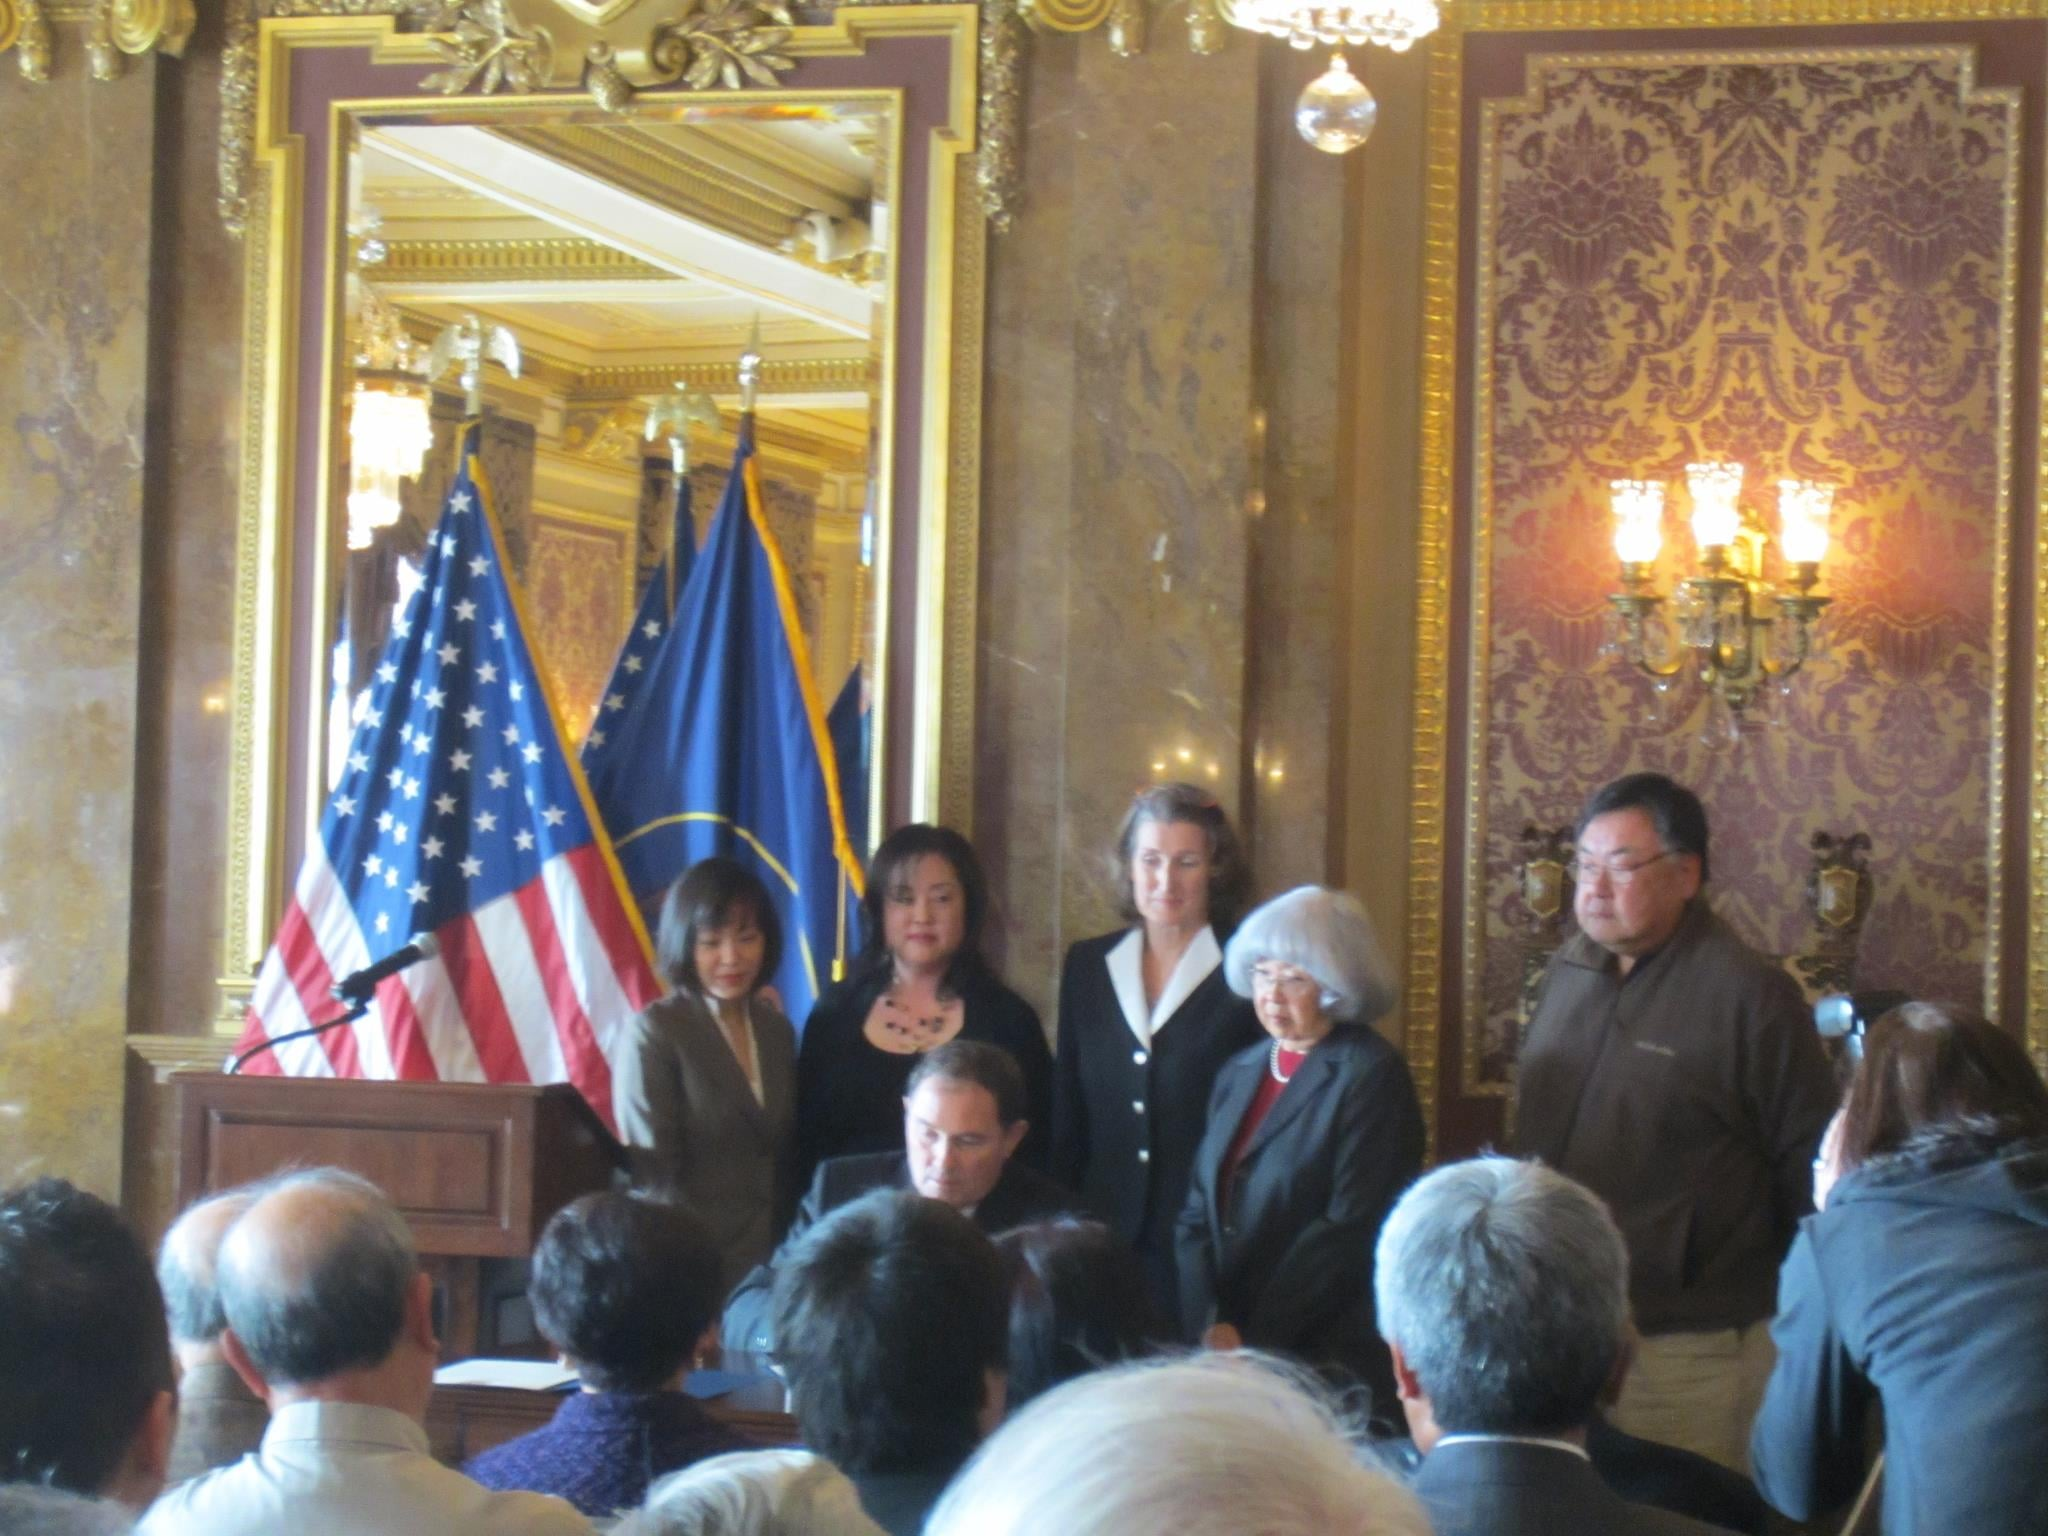 Utah Governor Gary Herbert signs the Fred Korematsu Day declaration today for January 30, 2013 as KI director Ling Woo Liu, former Salt Lake County Councilmember Jani Iwamoto, Topaz Museum board director Jane Beckwith, JACL-Salt Lake City co-president Jeanette Misaka look on.